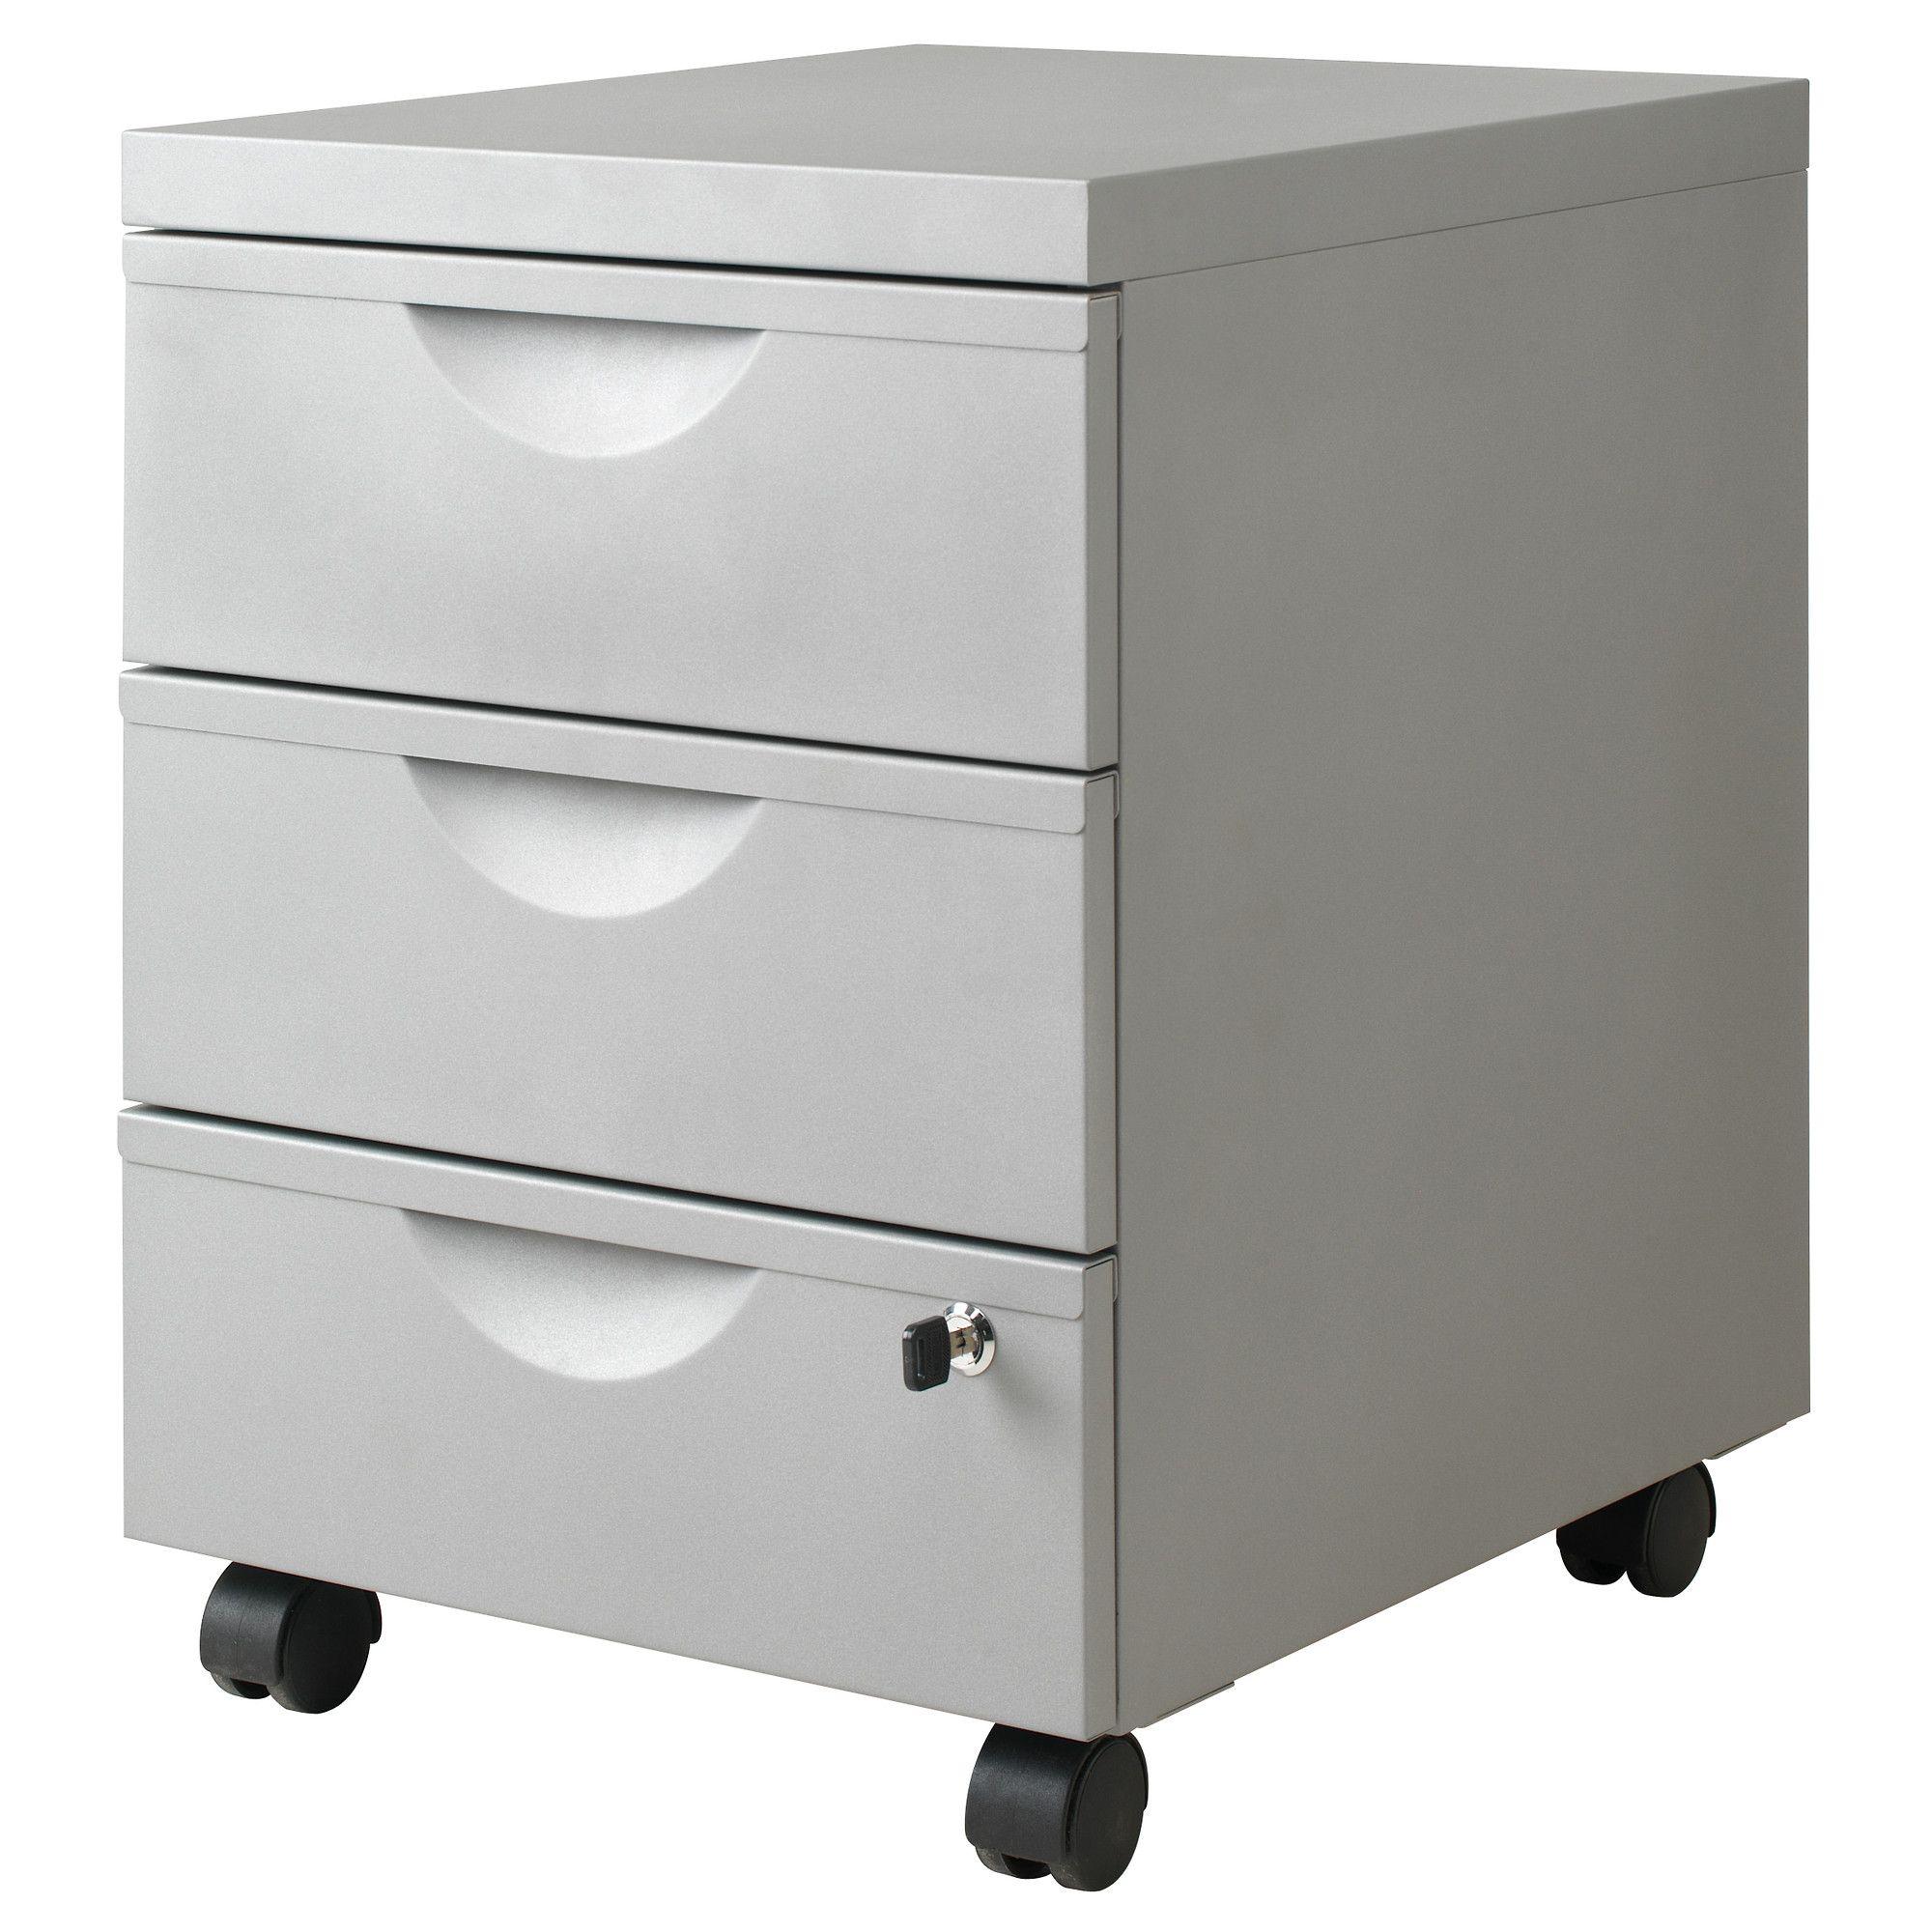 ERIK Drawer Unit W 3 Drawers On Casters   IKEA. Epoxy Coated Steel. Width